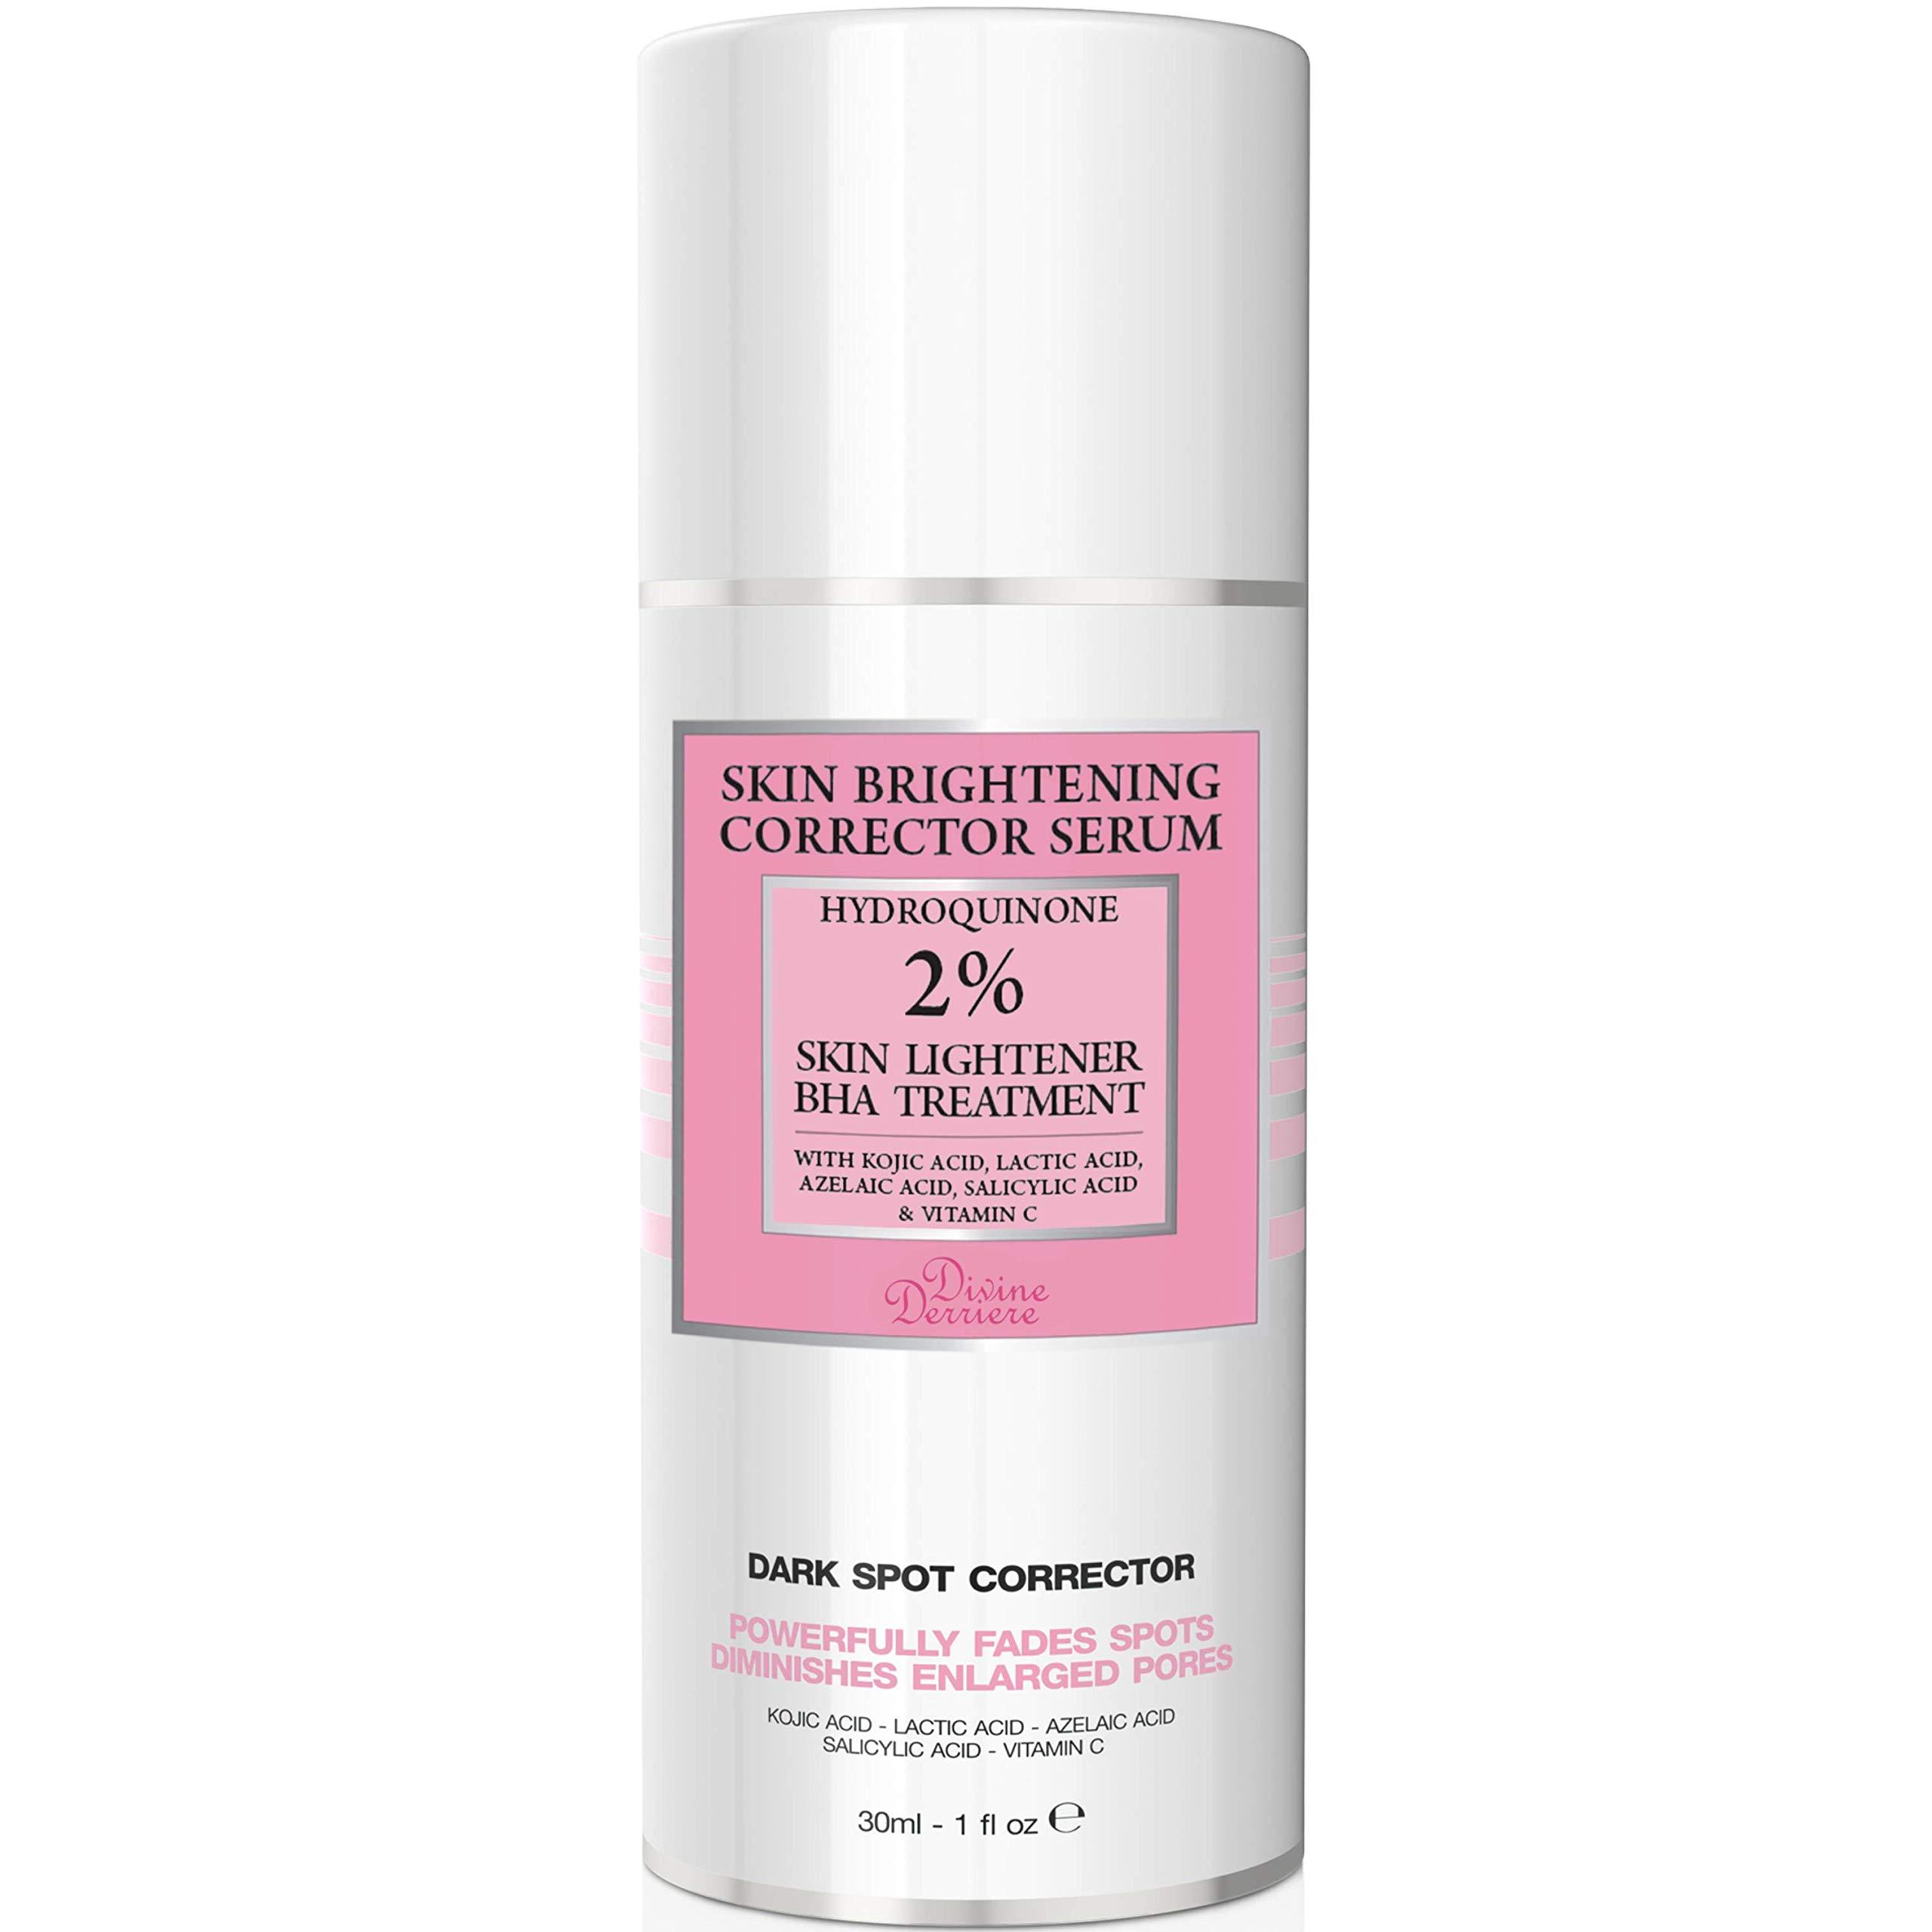 2% Hydroquinone Dark Spot Corrector Remover For Face & Melasma Treatment Fade Cream - Contains Vitamin C, Salicylic Acid, Kojic Acid, Azelaic Acid and Lactic Acid Peel 1 oz